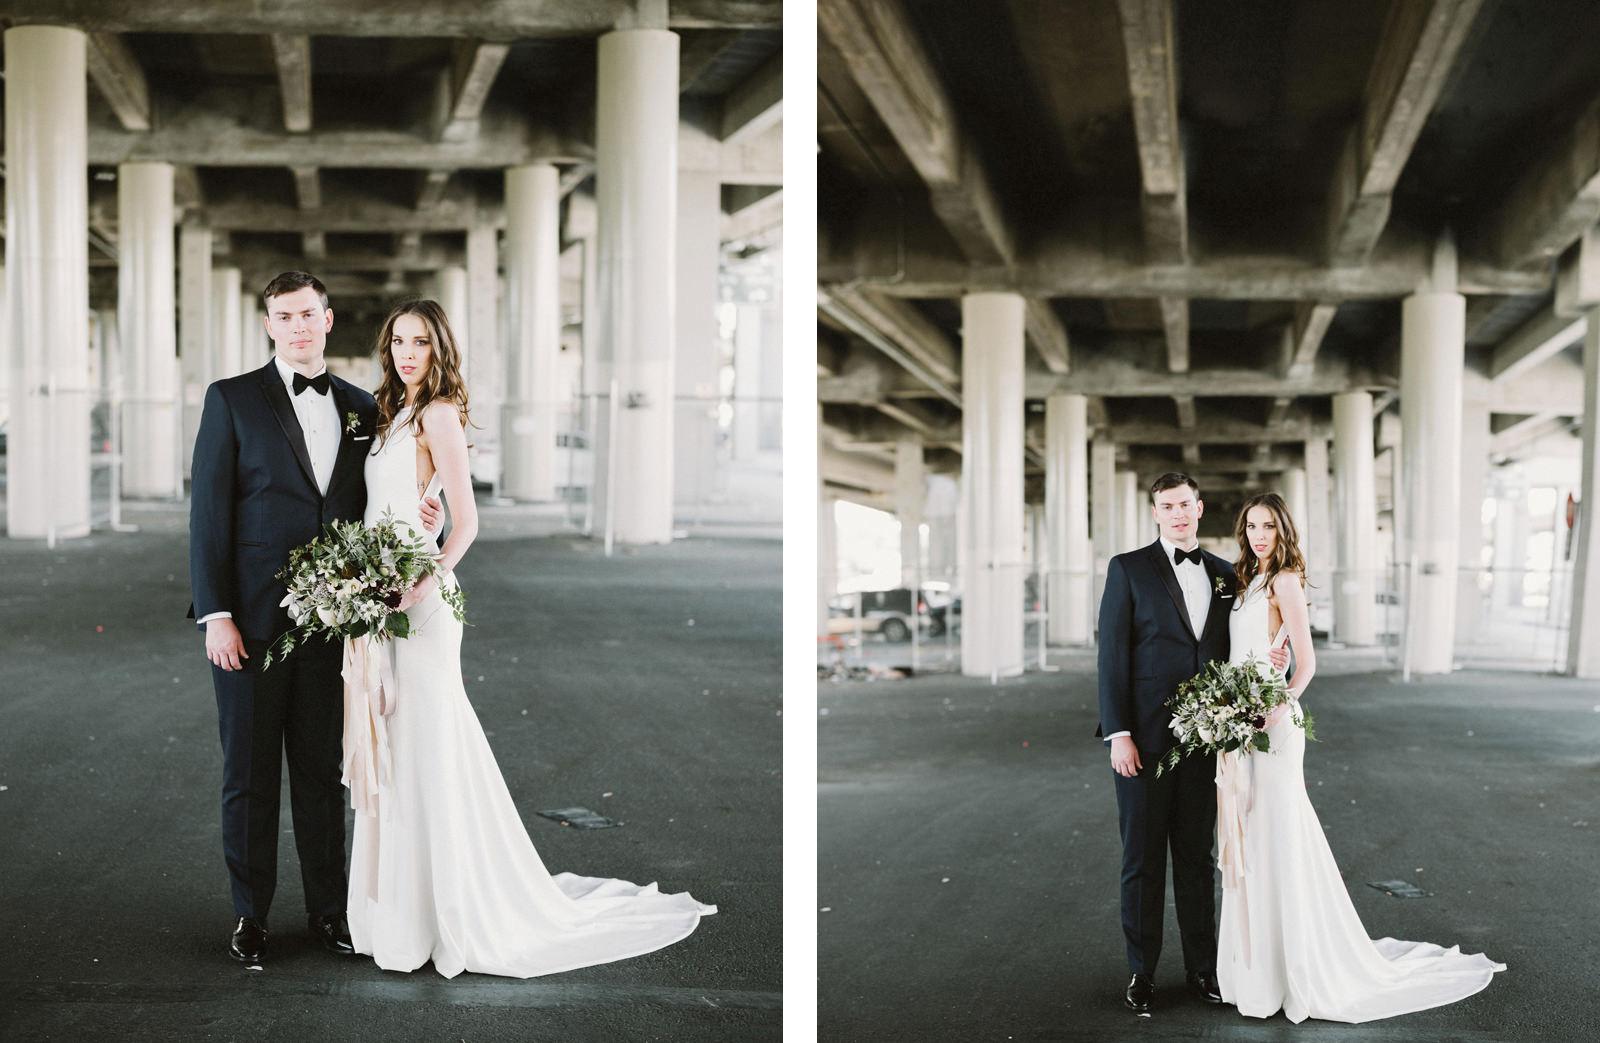 sodo-park-wedding-020 SODO PARK WEDDING